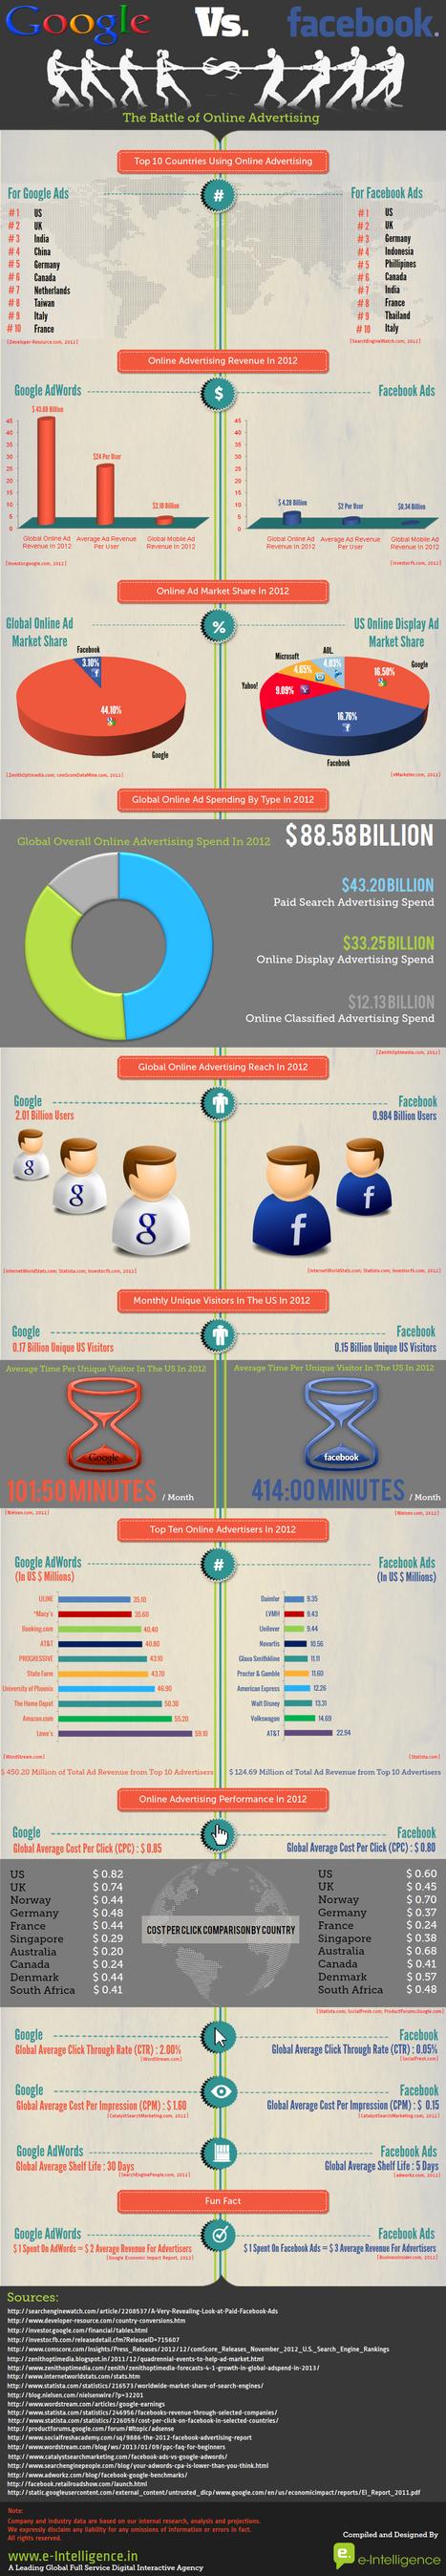 [Infographic] Google vs. Facebook Battle of Online Advertising - e-Intelligence | Milestone 3 | Scoop.it